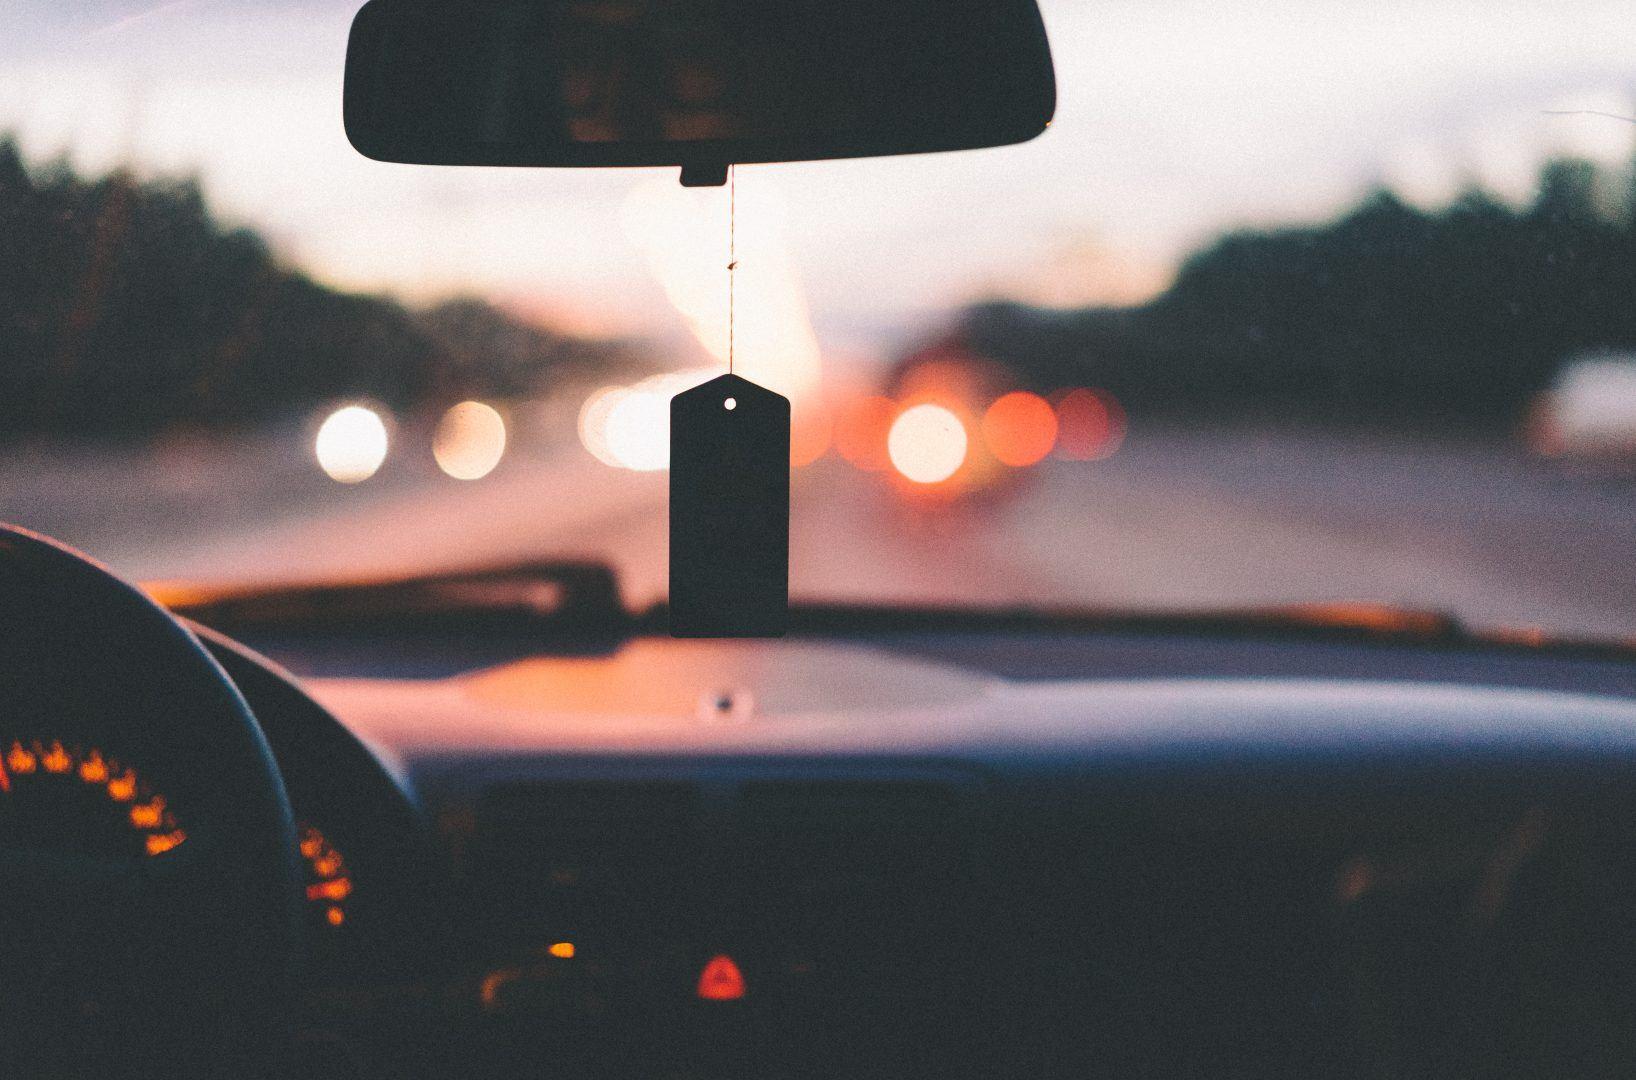 Driving responsibly? Progressive wants to make sure